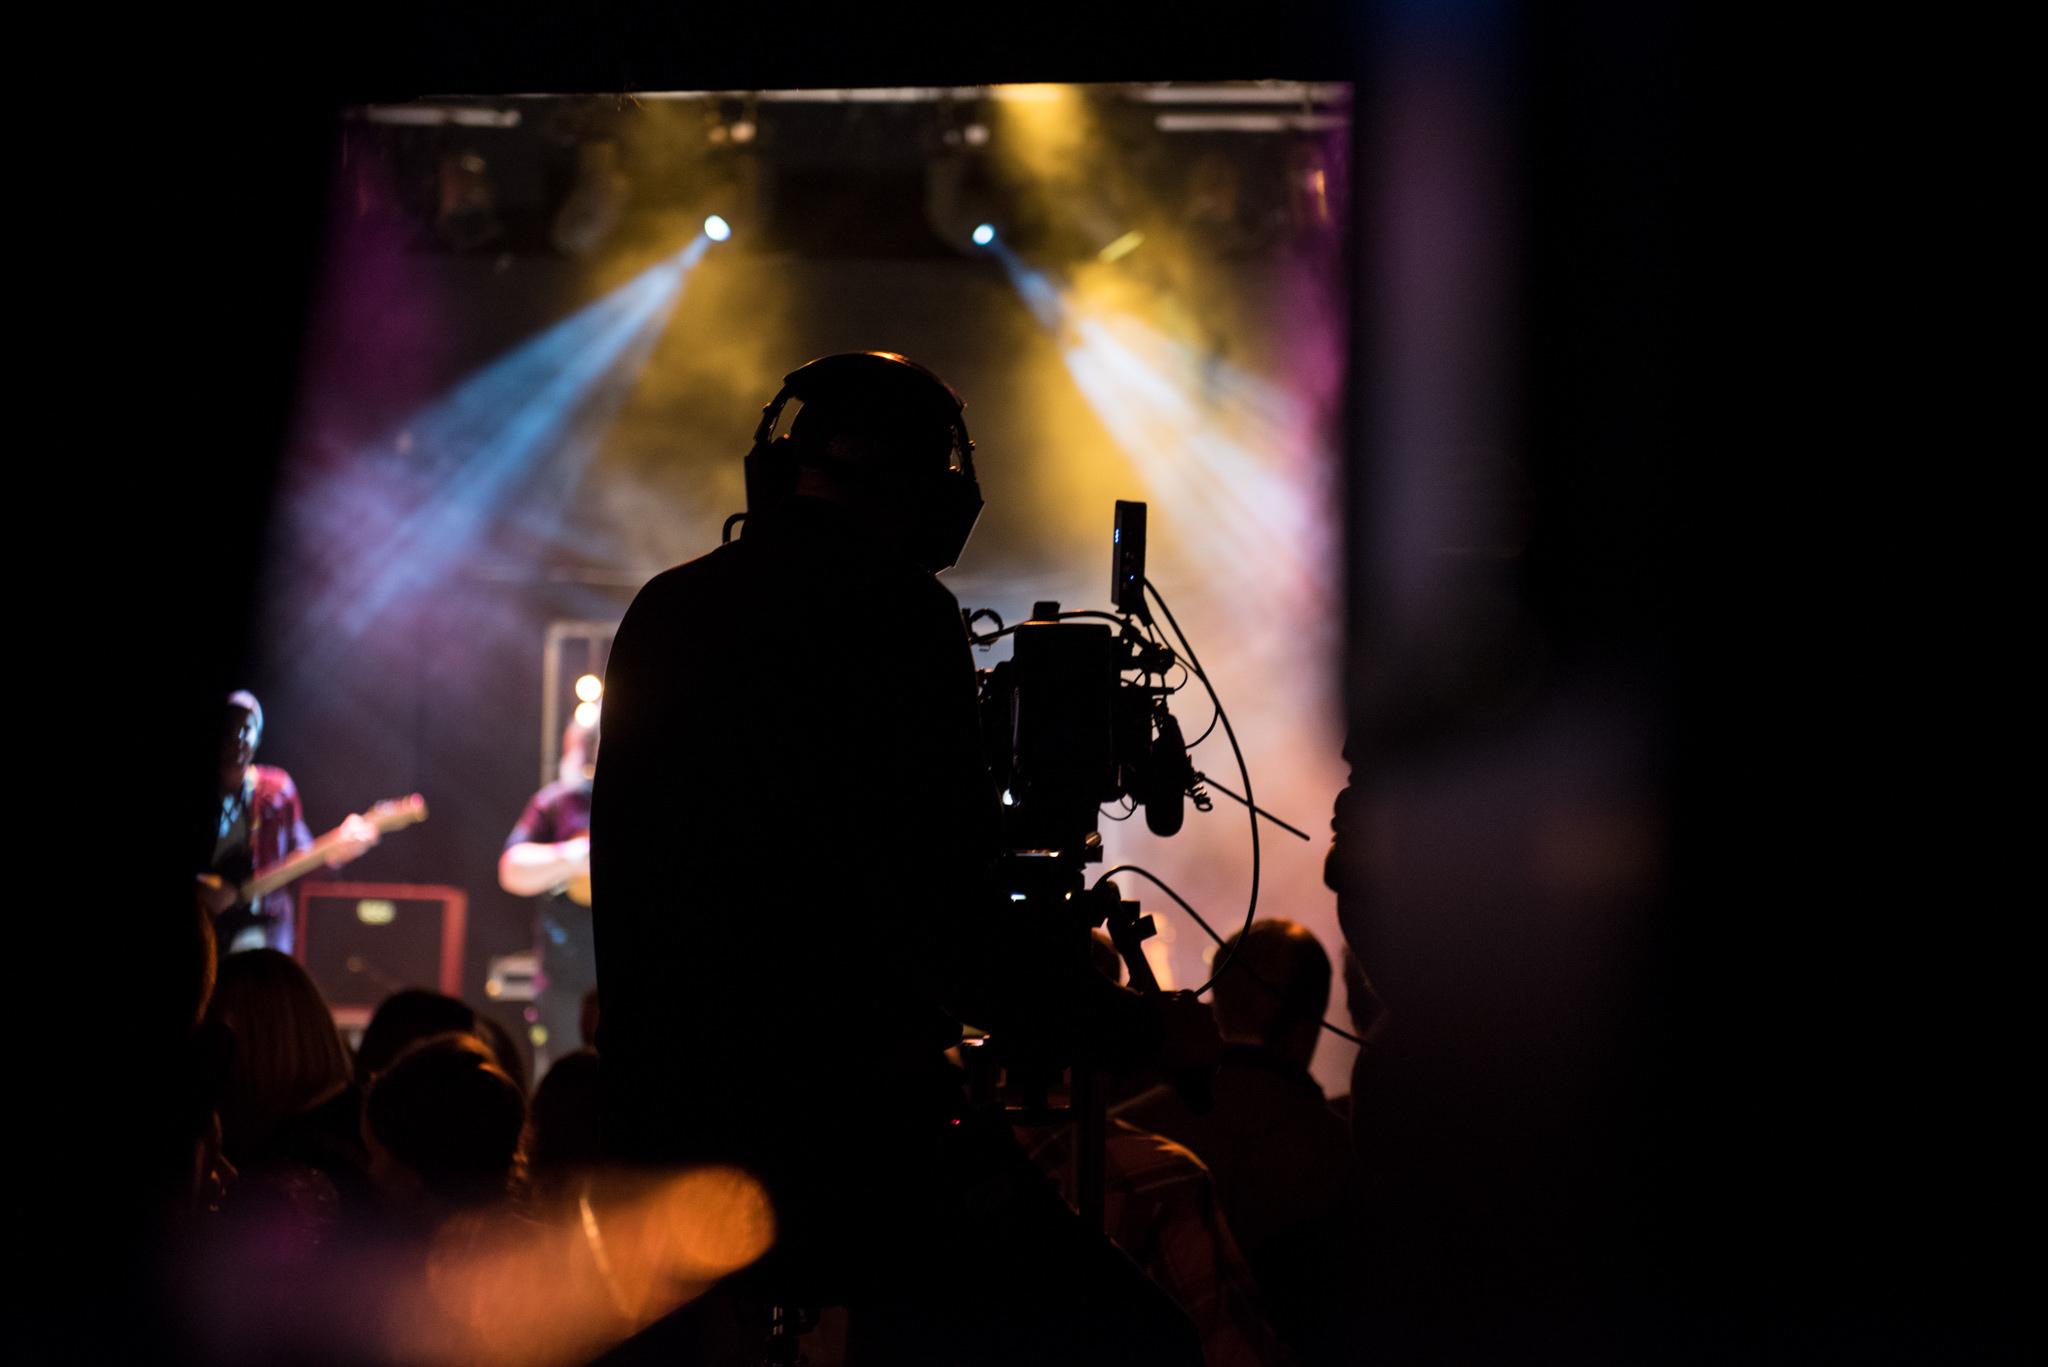 bbc-alba-bees-nees-camera-backstage-tv-music-gig-elephant-sessions.jpg